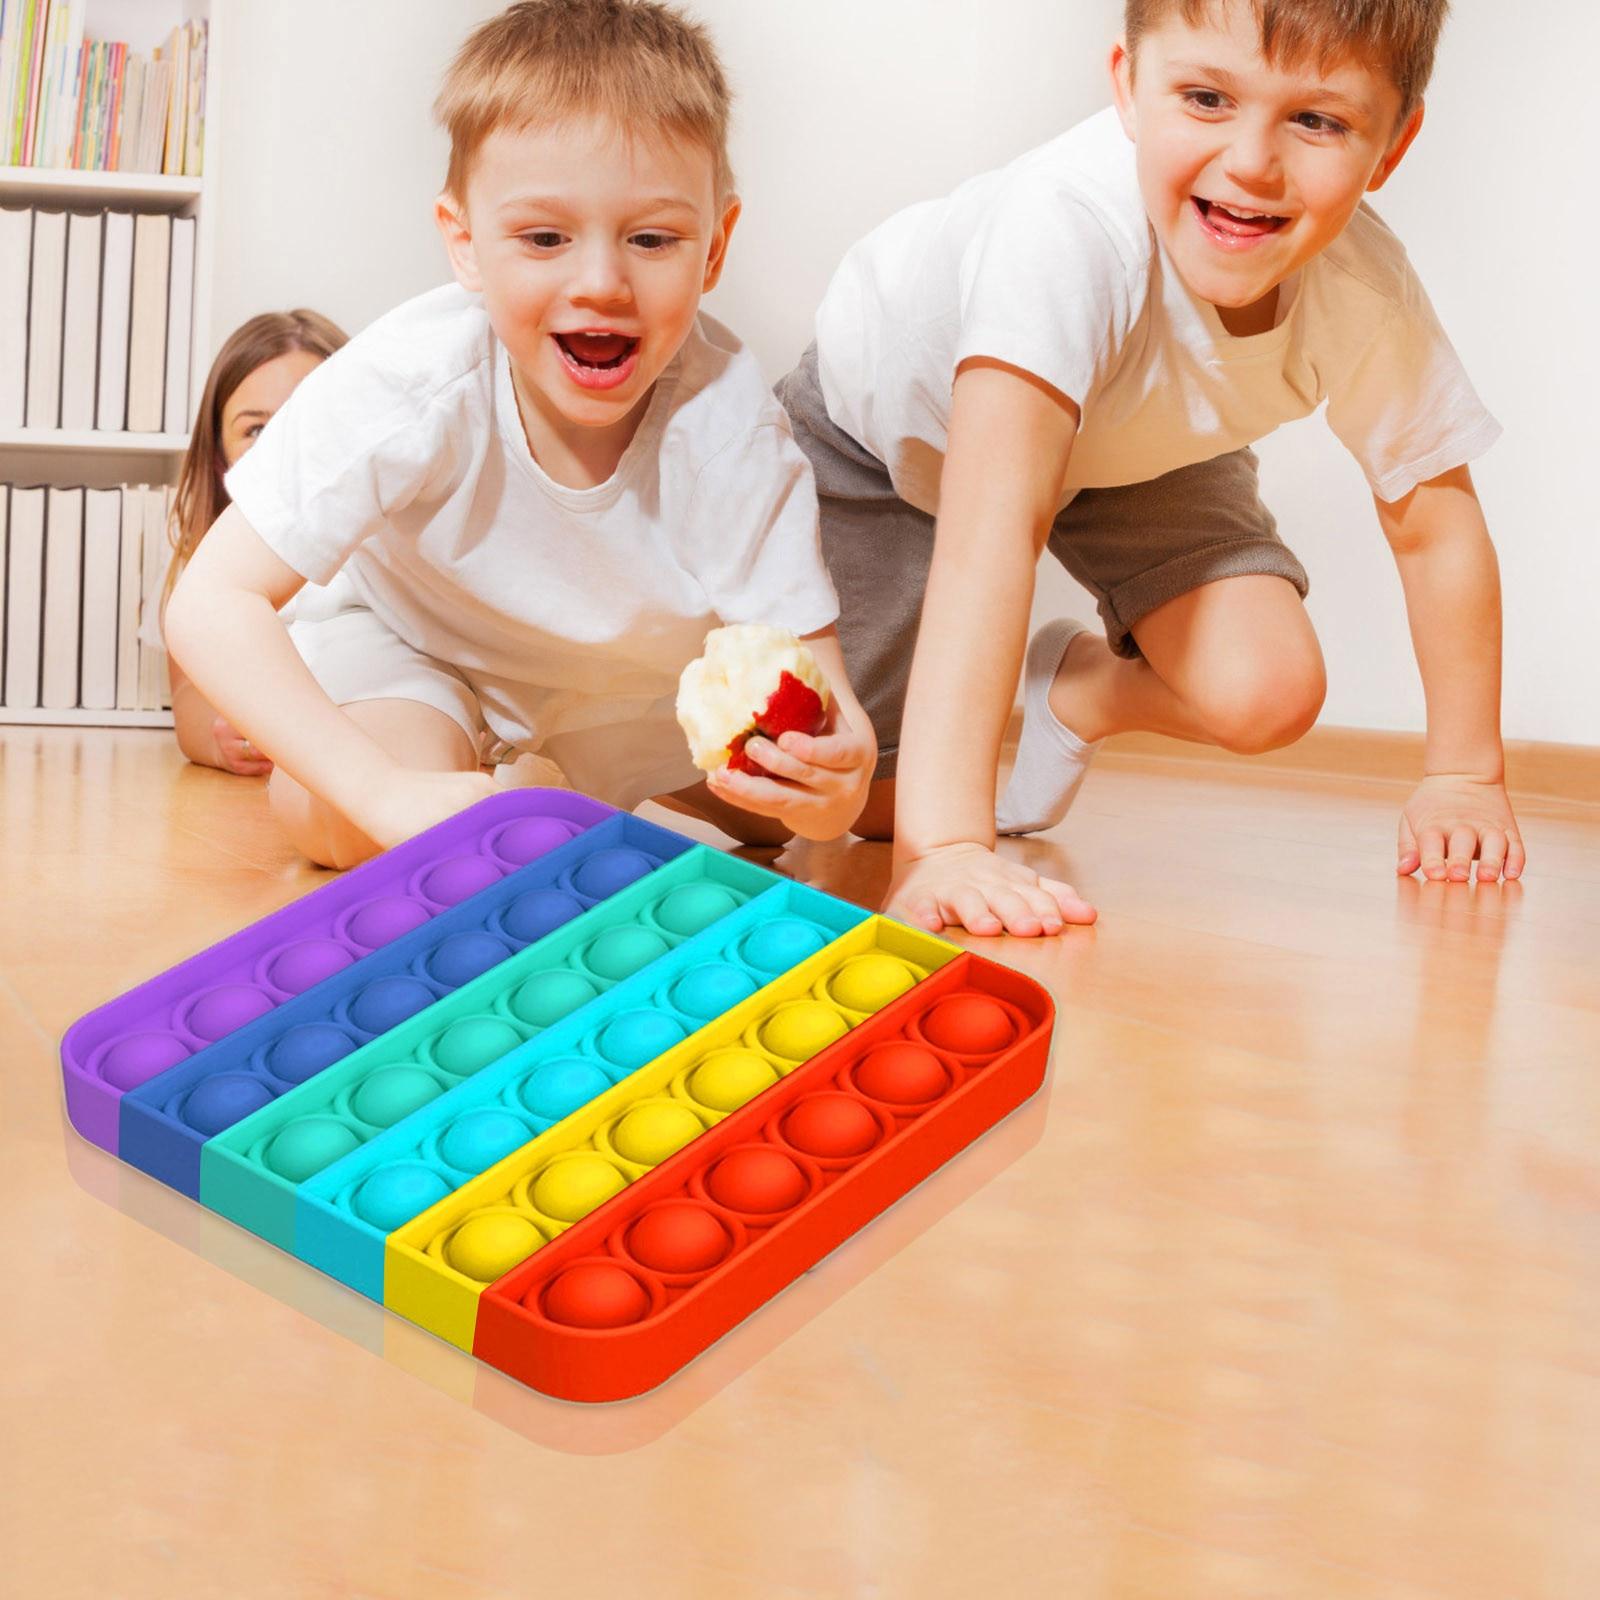 Fitget-Toys Fidget Pop-It-Game Popoit Sensory-Toy Needs-Stress Push Bubble Reliever Adult